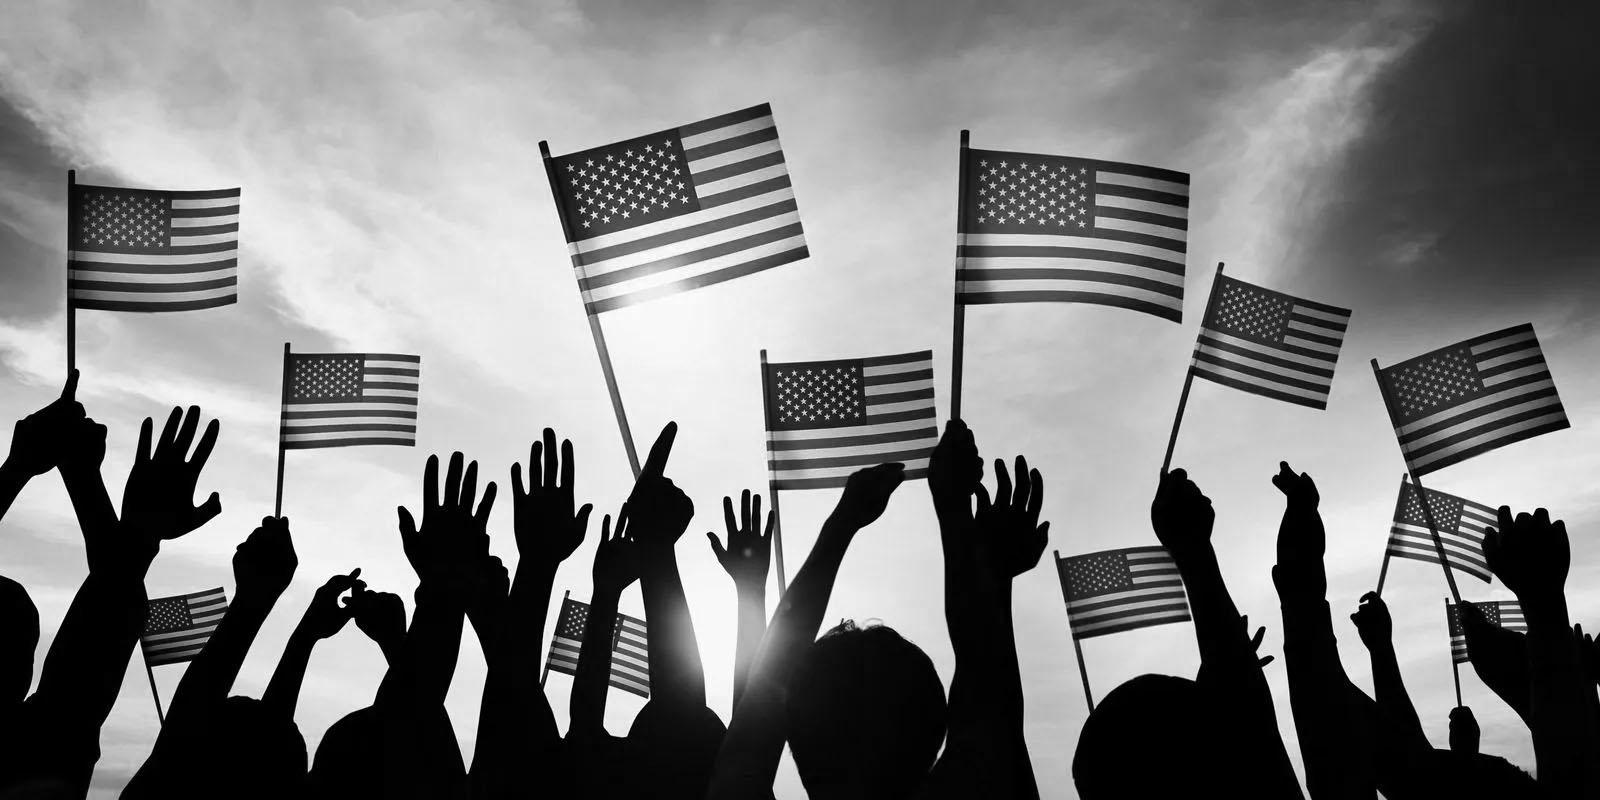 people-holding-flags-B&W.jpg